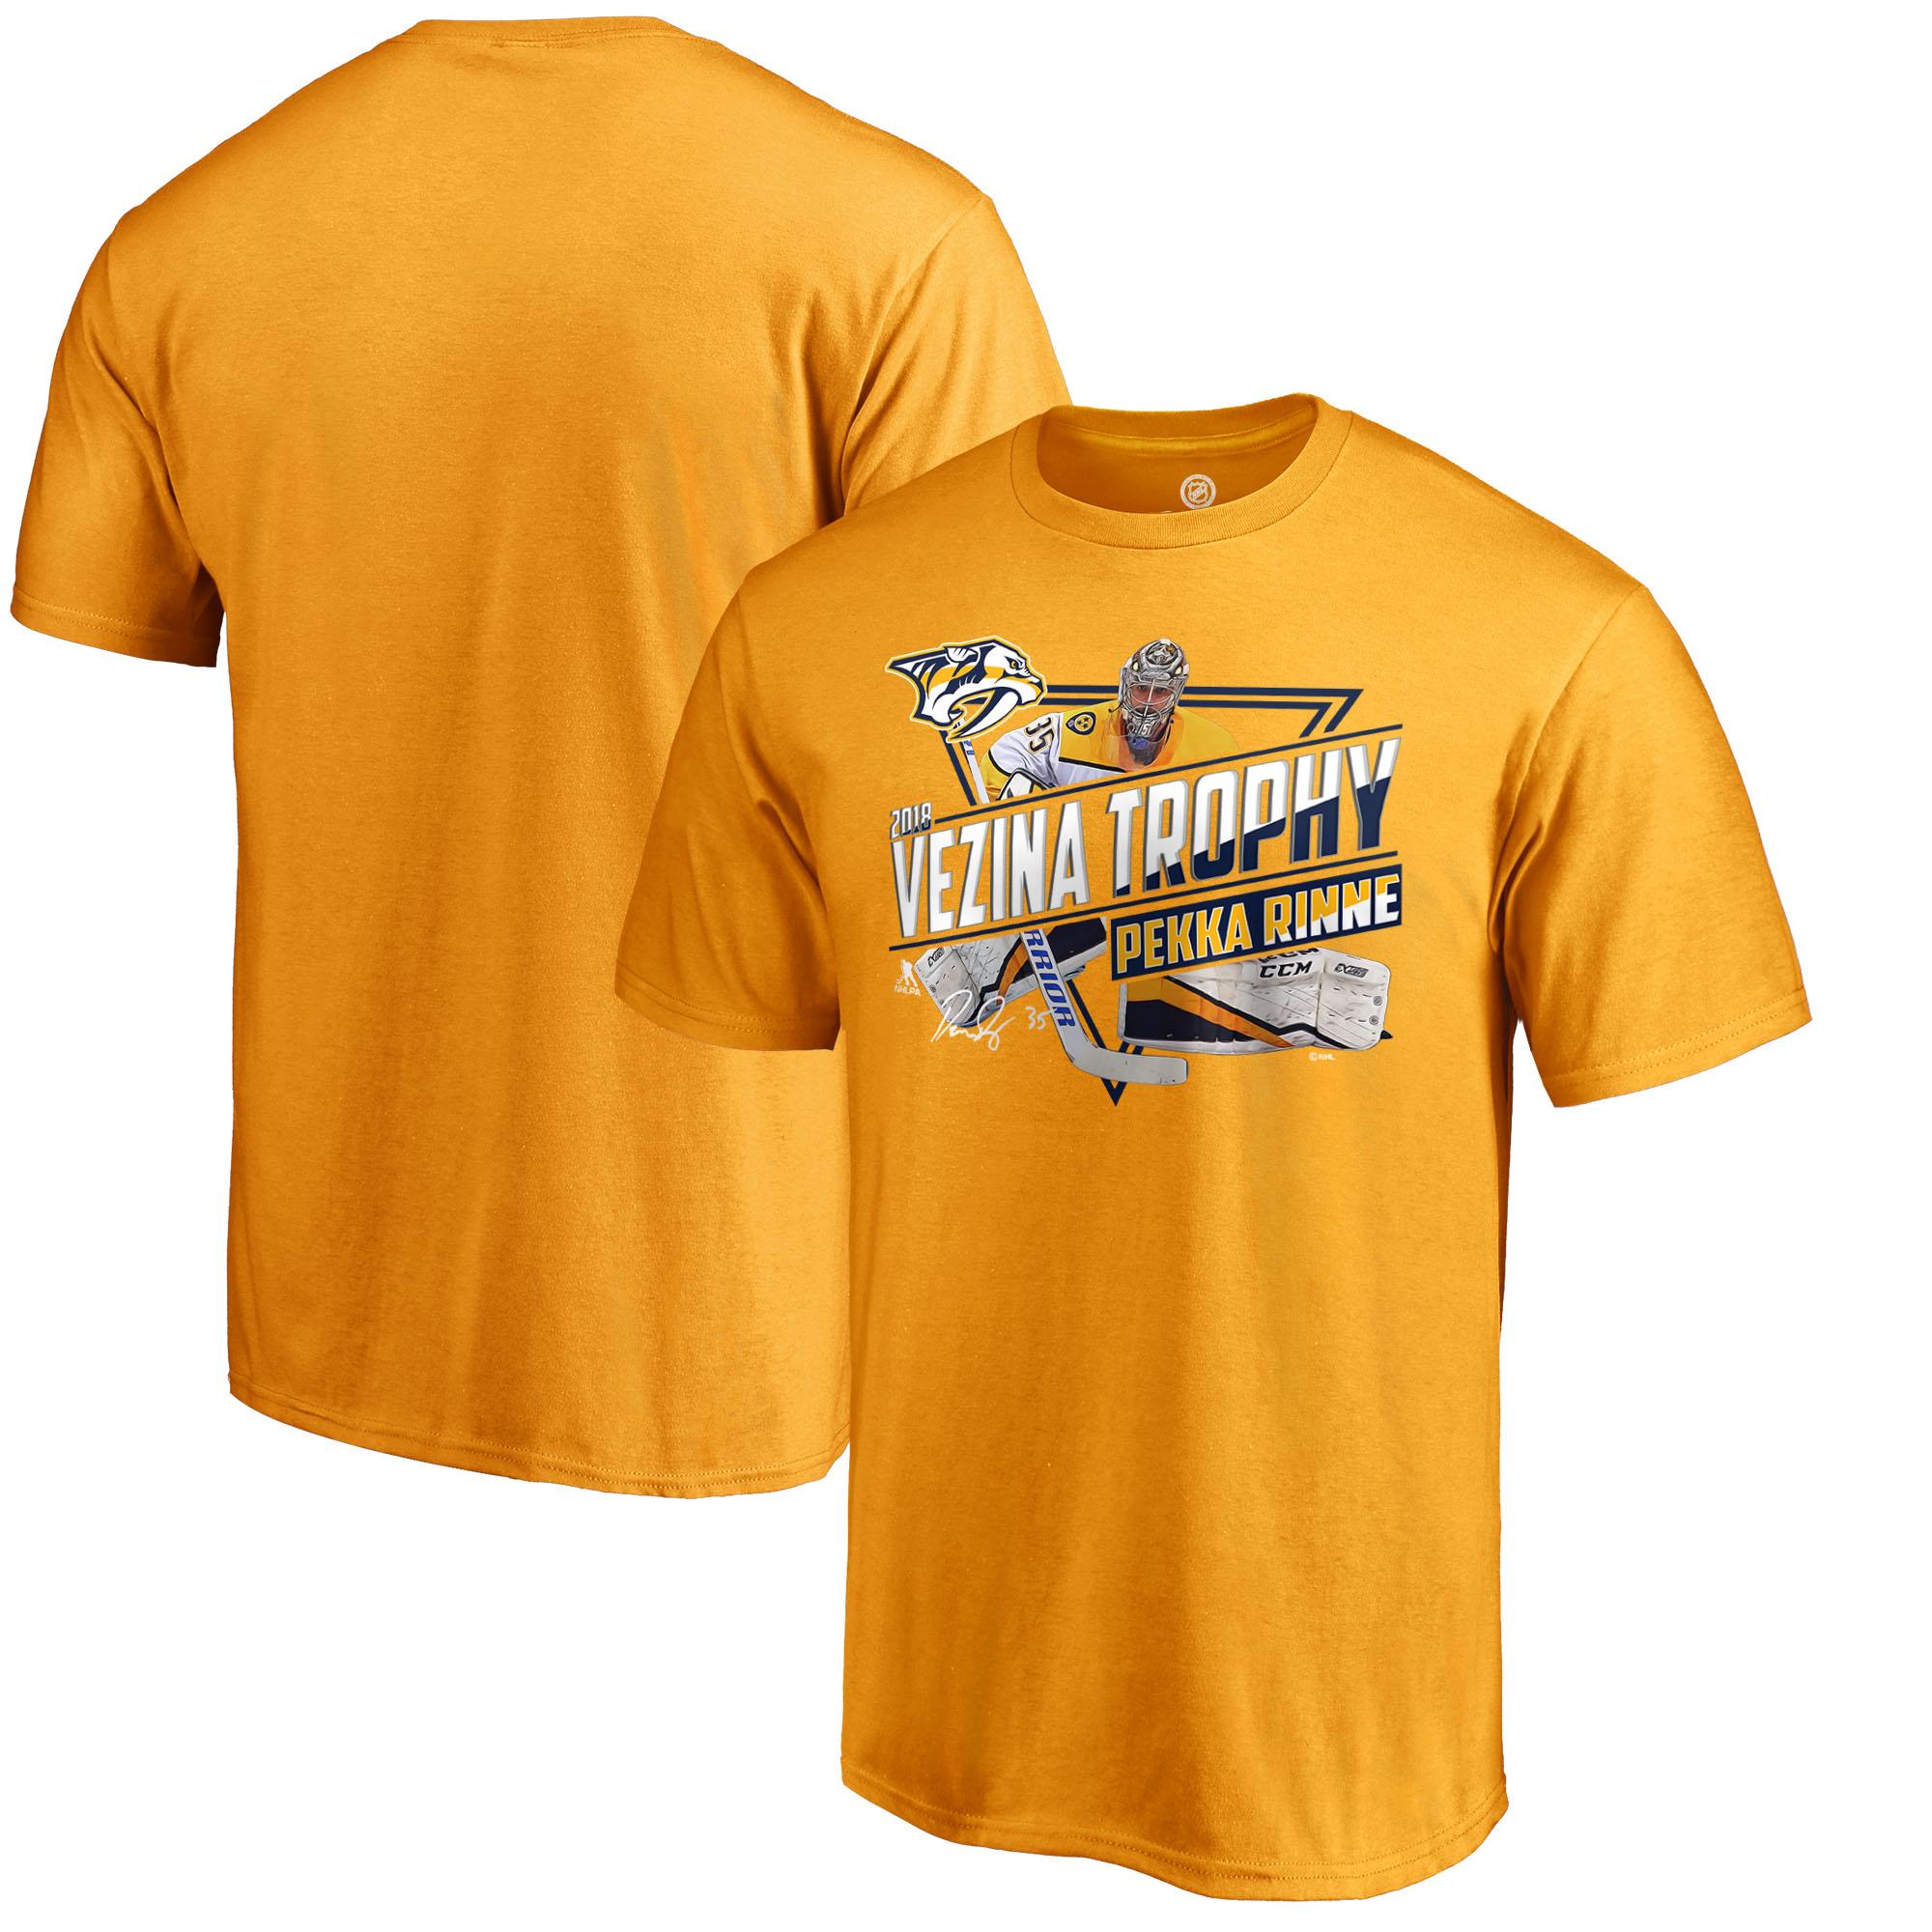 Pekka Rinne Nashville Predators Fanatics Branded 2018 Vezina Trophy Winner T-Shirt - Gold